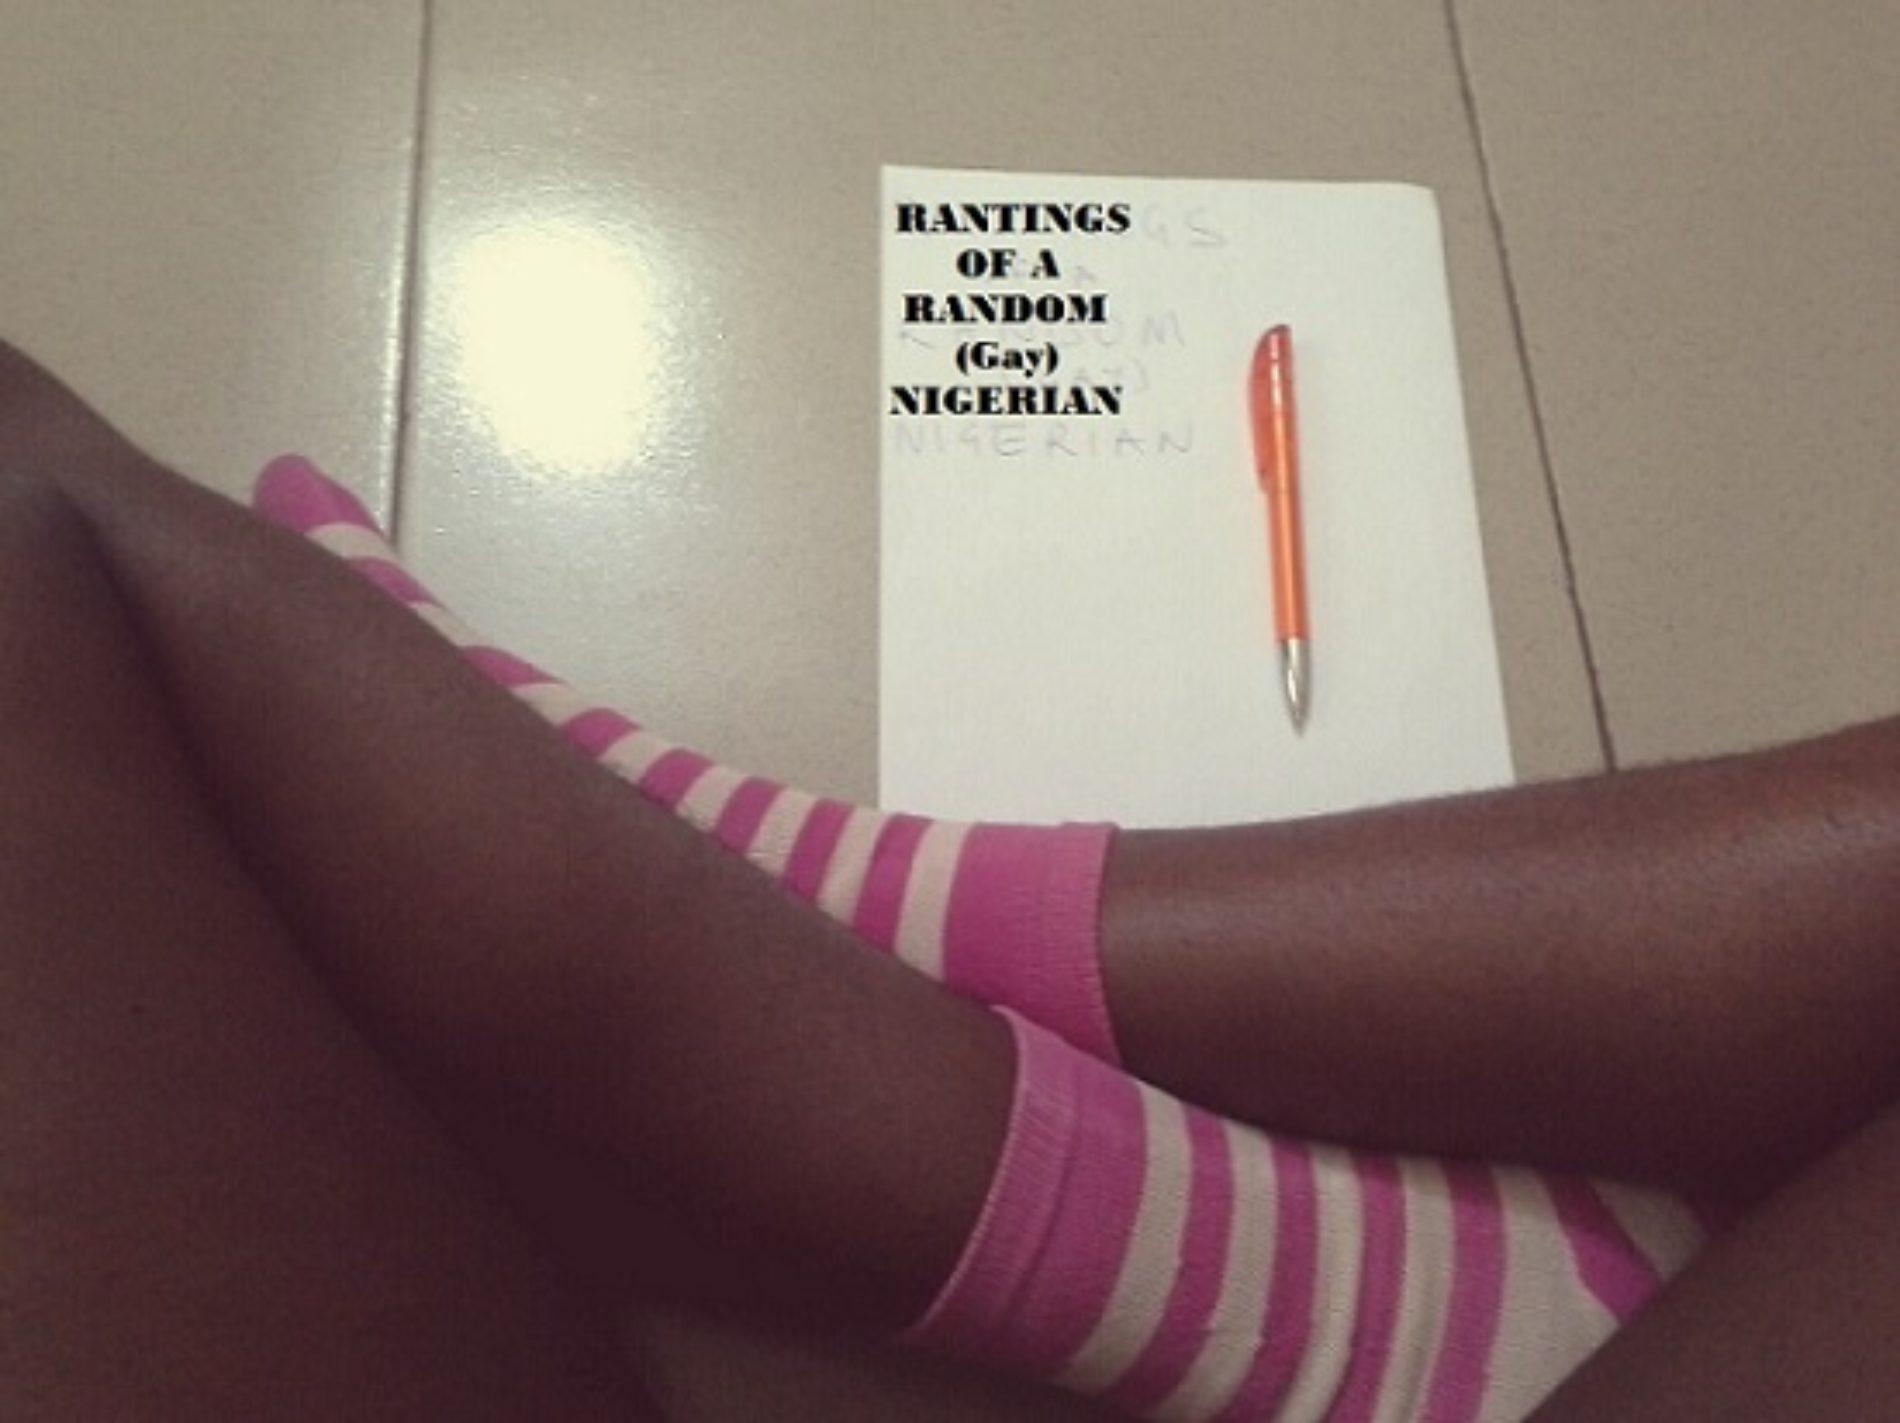 RANTINGS OF A RANDOM (Gay) NIGERIAN (Entry 58)